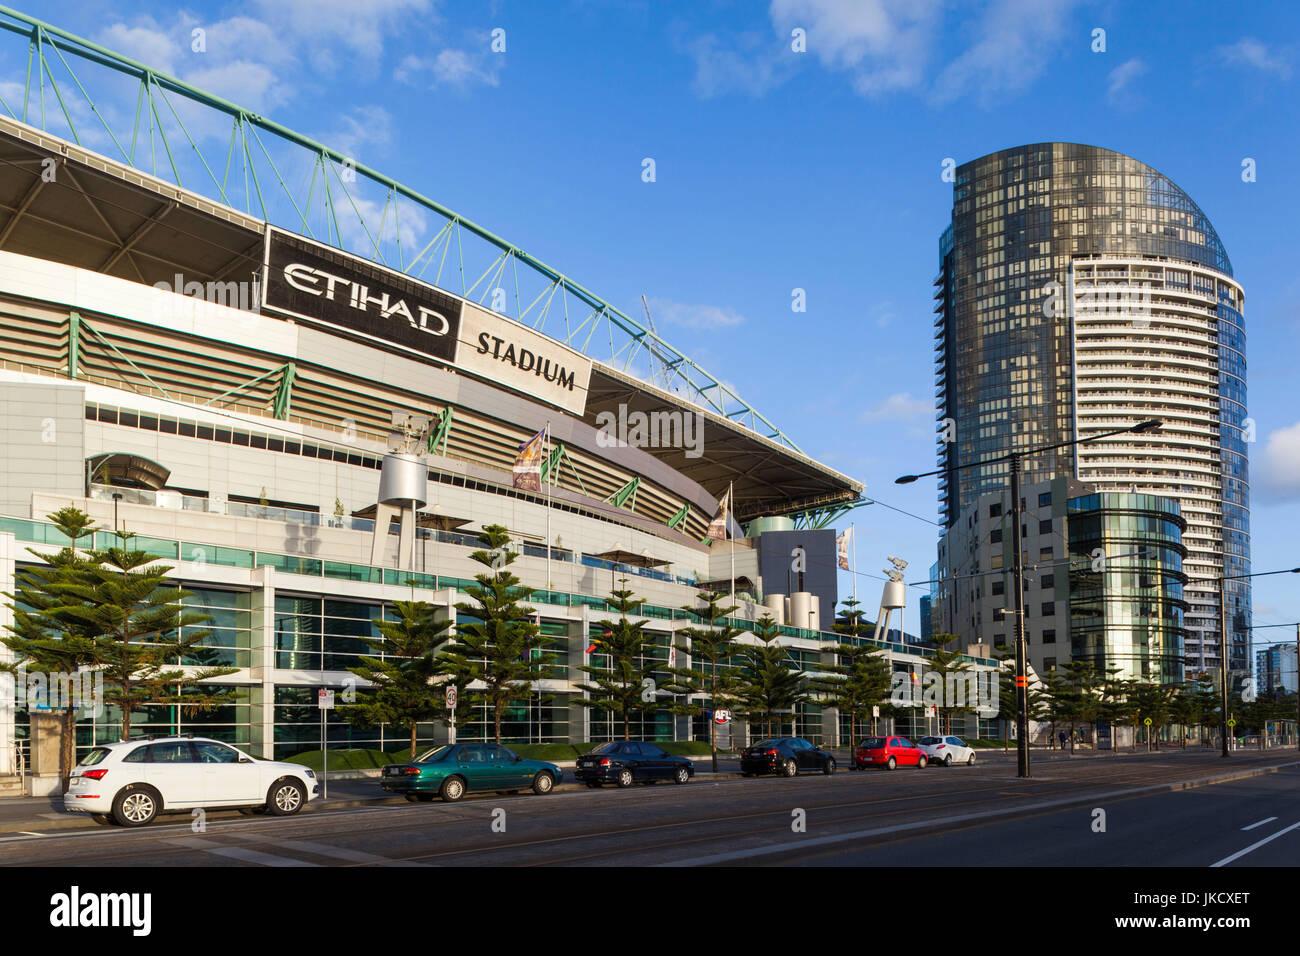 Australia, Victoria, VIC, Melbourne, Docklands, sul Porto Victoria Harbour Town, Complesso Etihad Stadium Immagini Stock